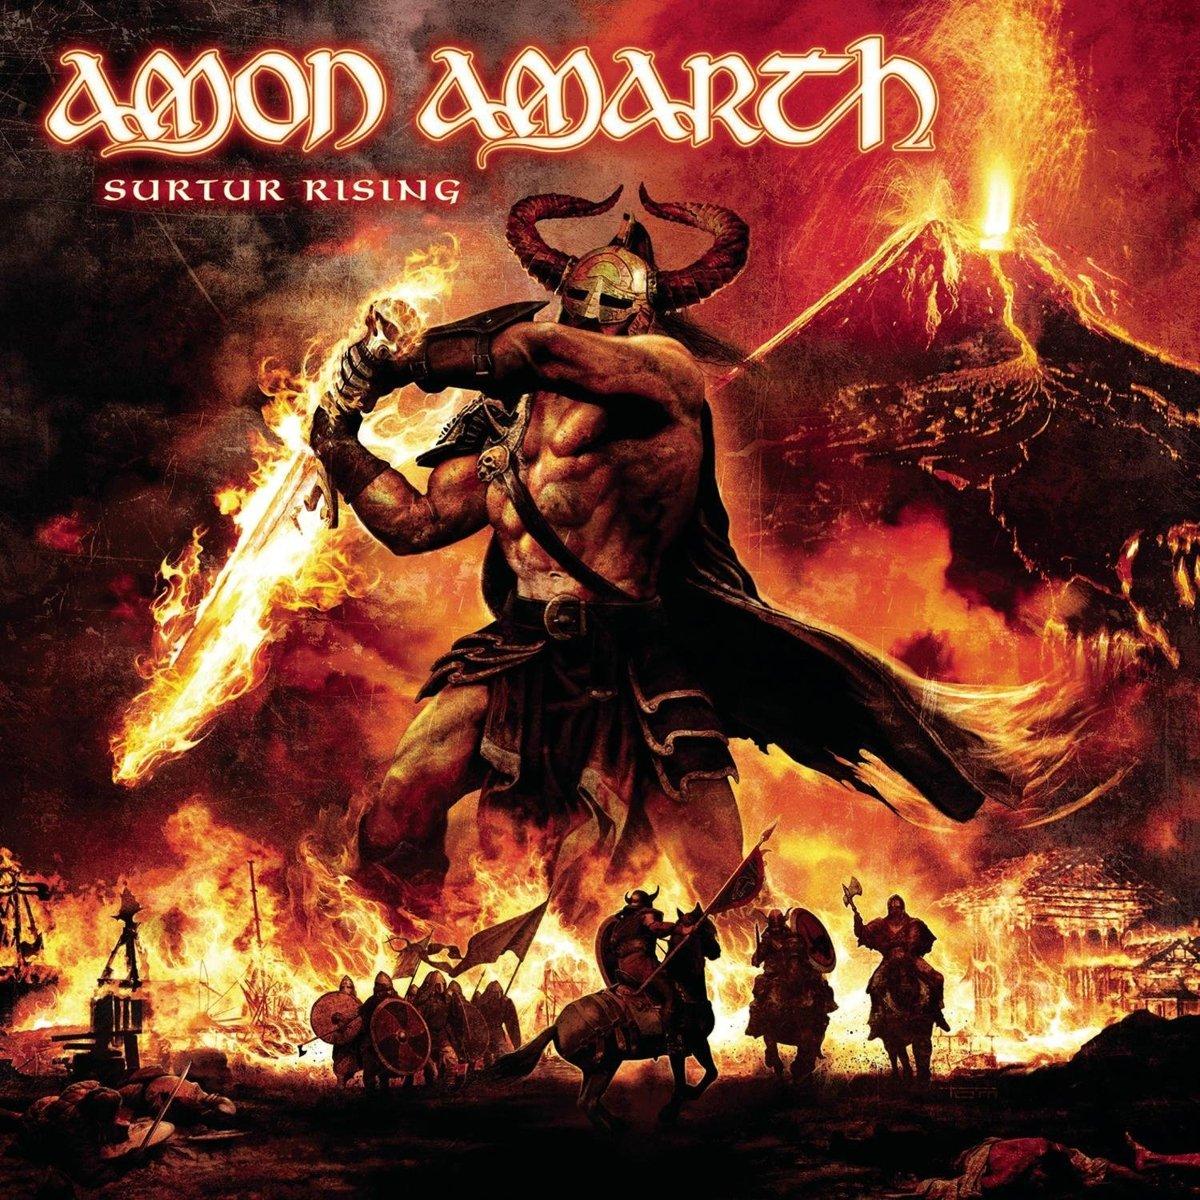 Vinilo : Amon Amarth - Surtur Rising (Picture Disc Vinyl LP)